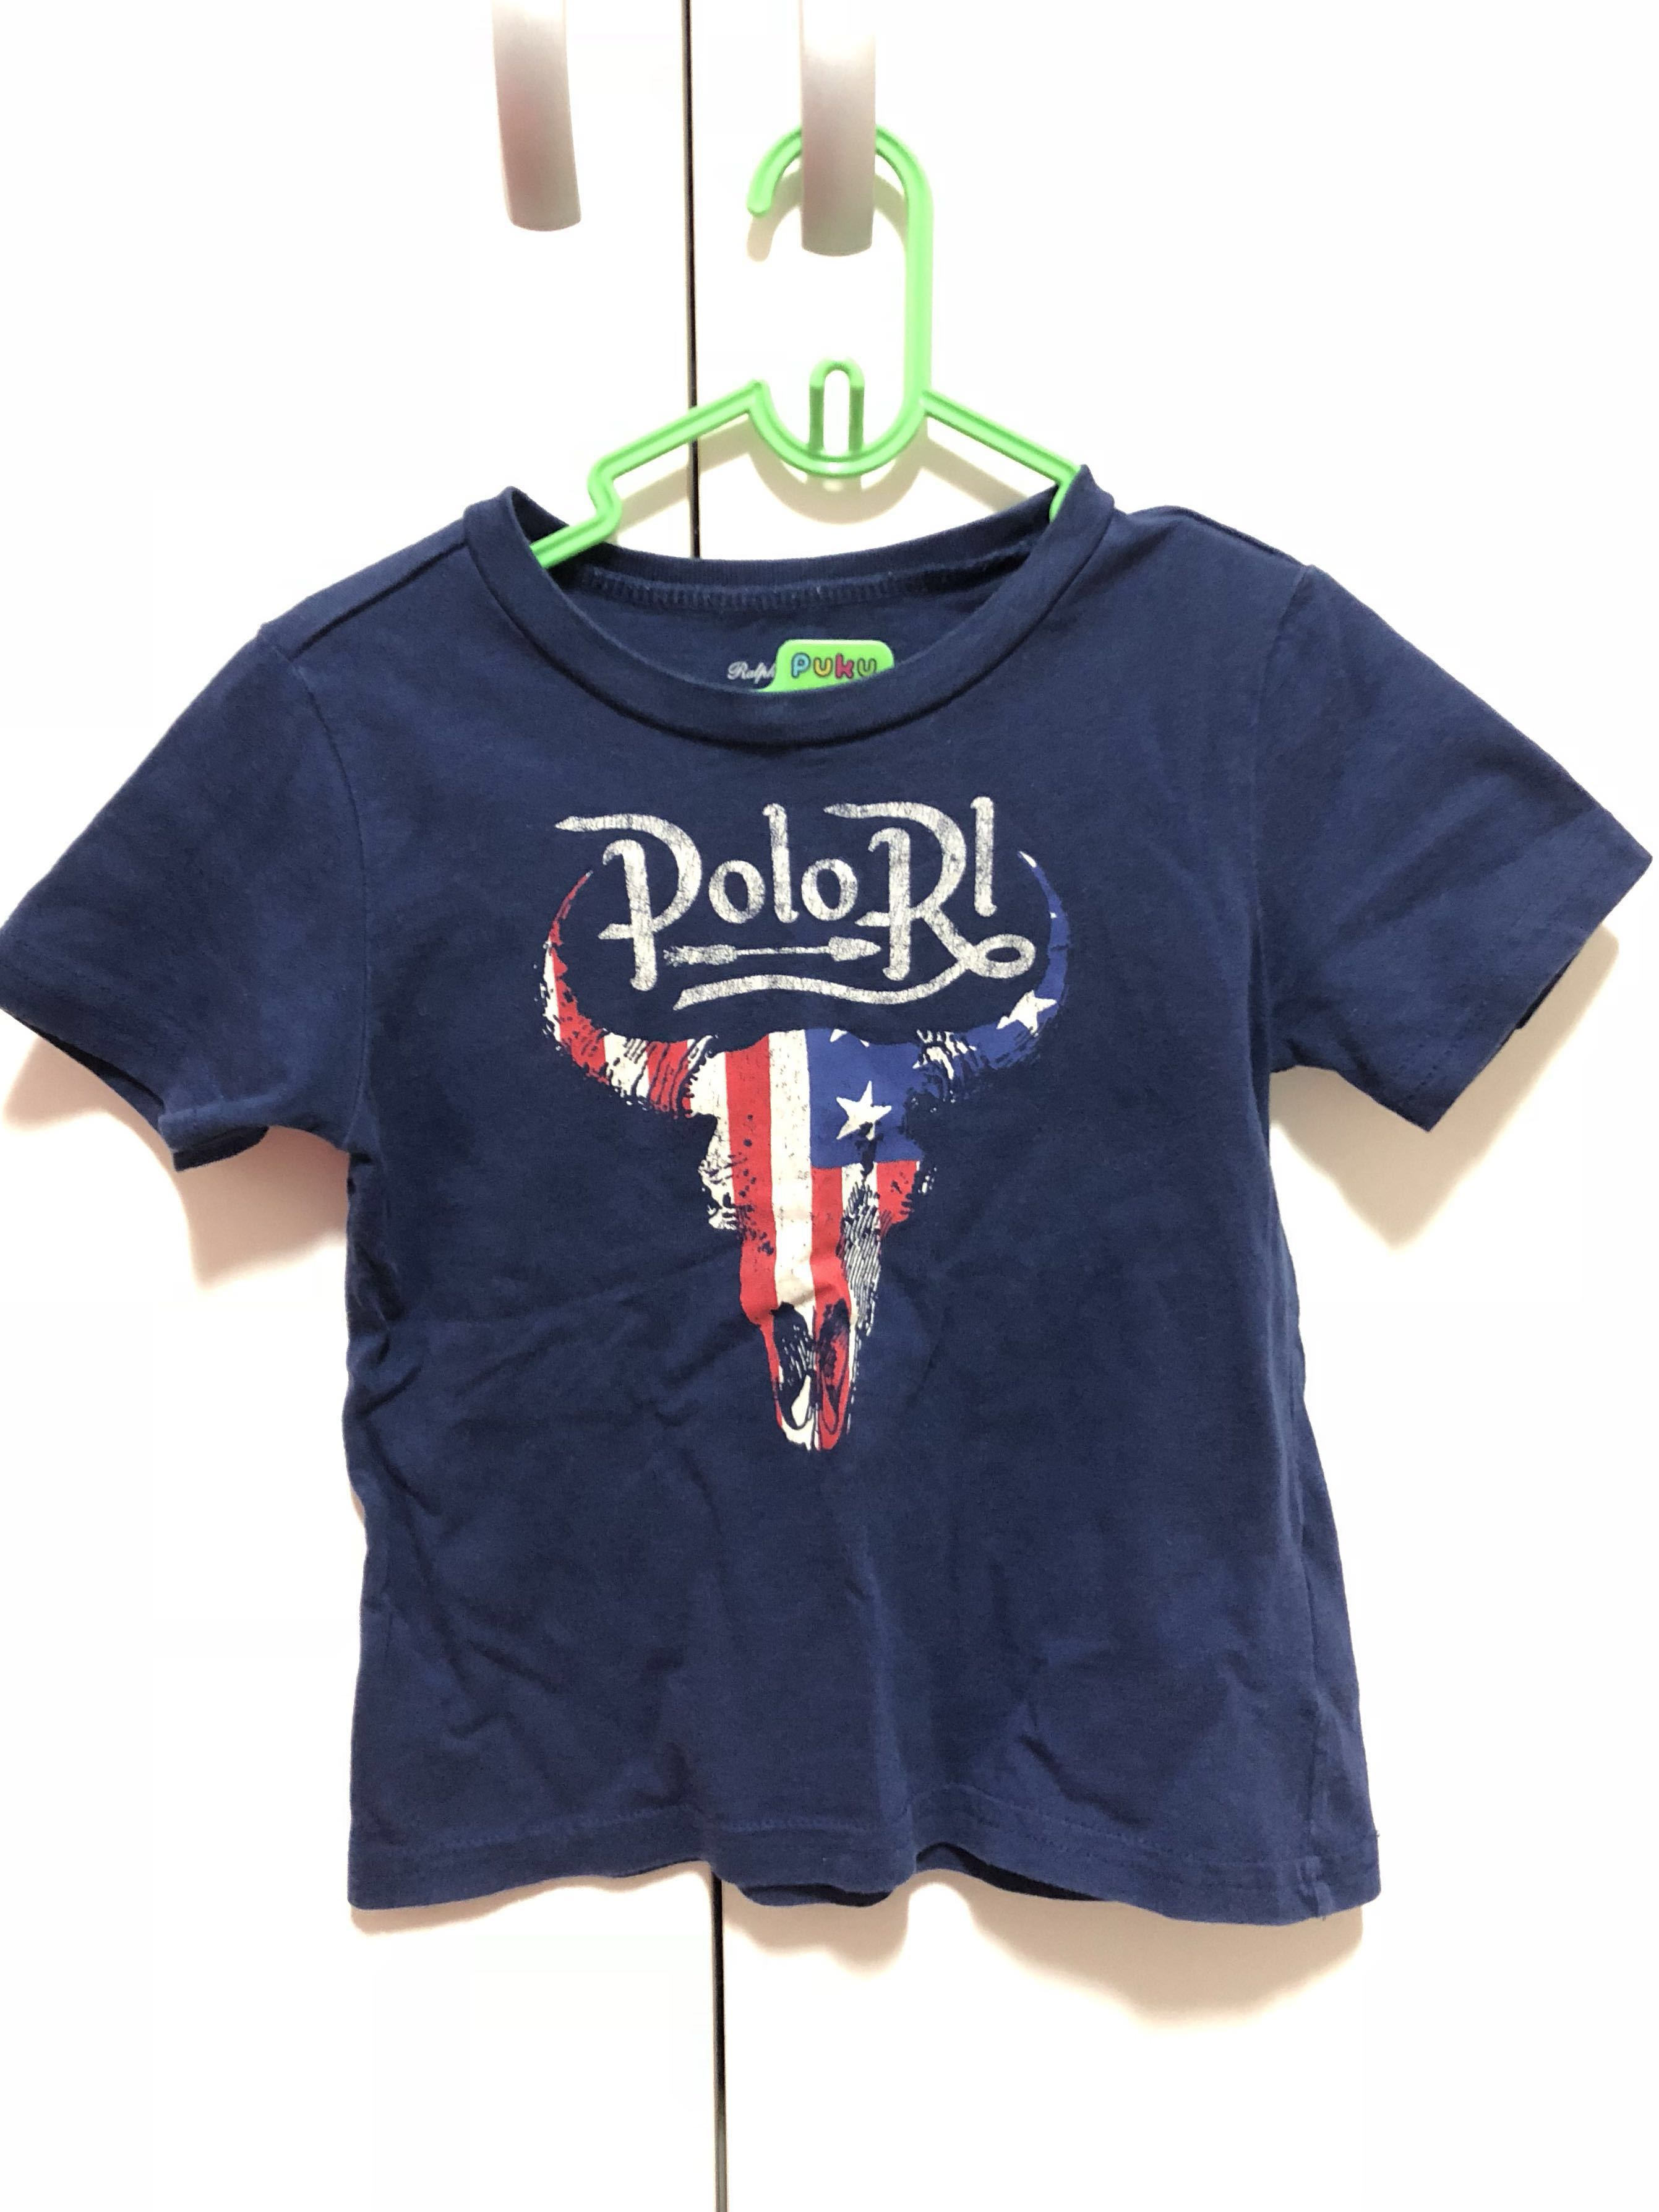 6fa7dacd03 Preloved authentic Polo Ralph Lauren RL T shirt 18m